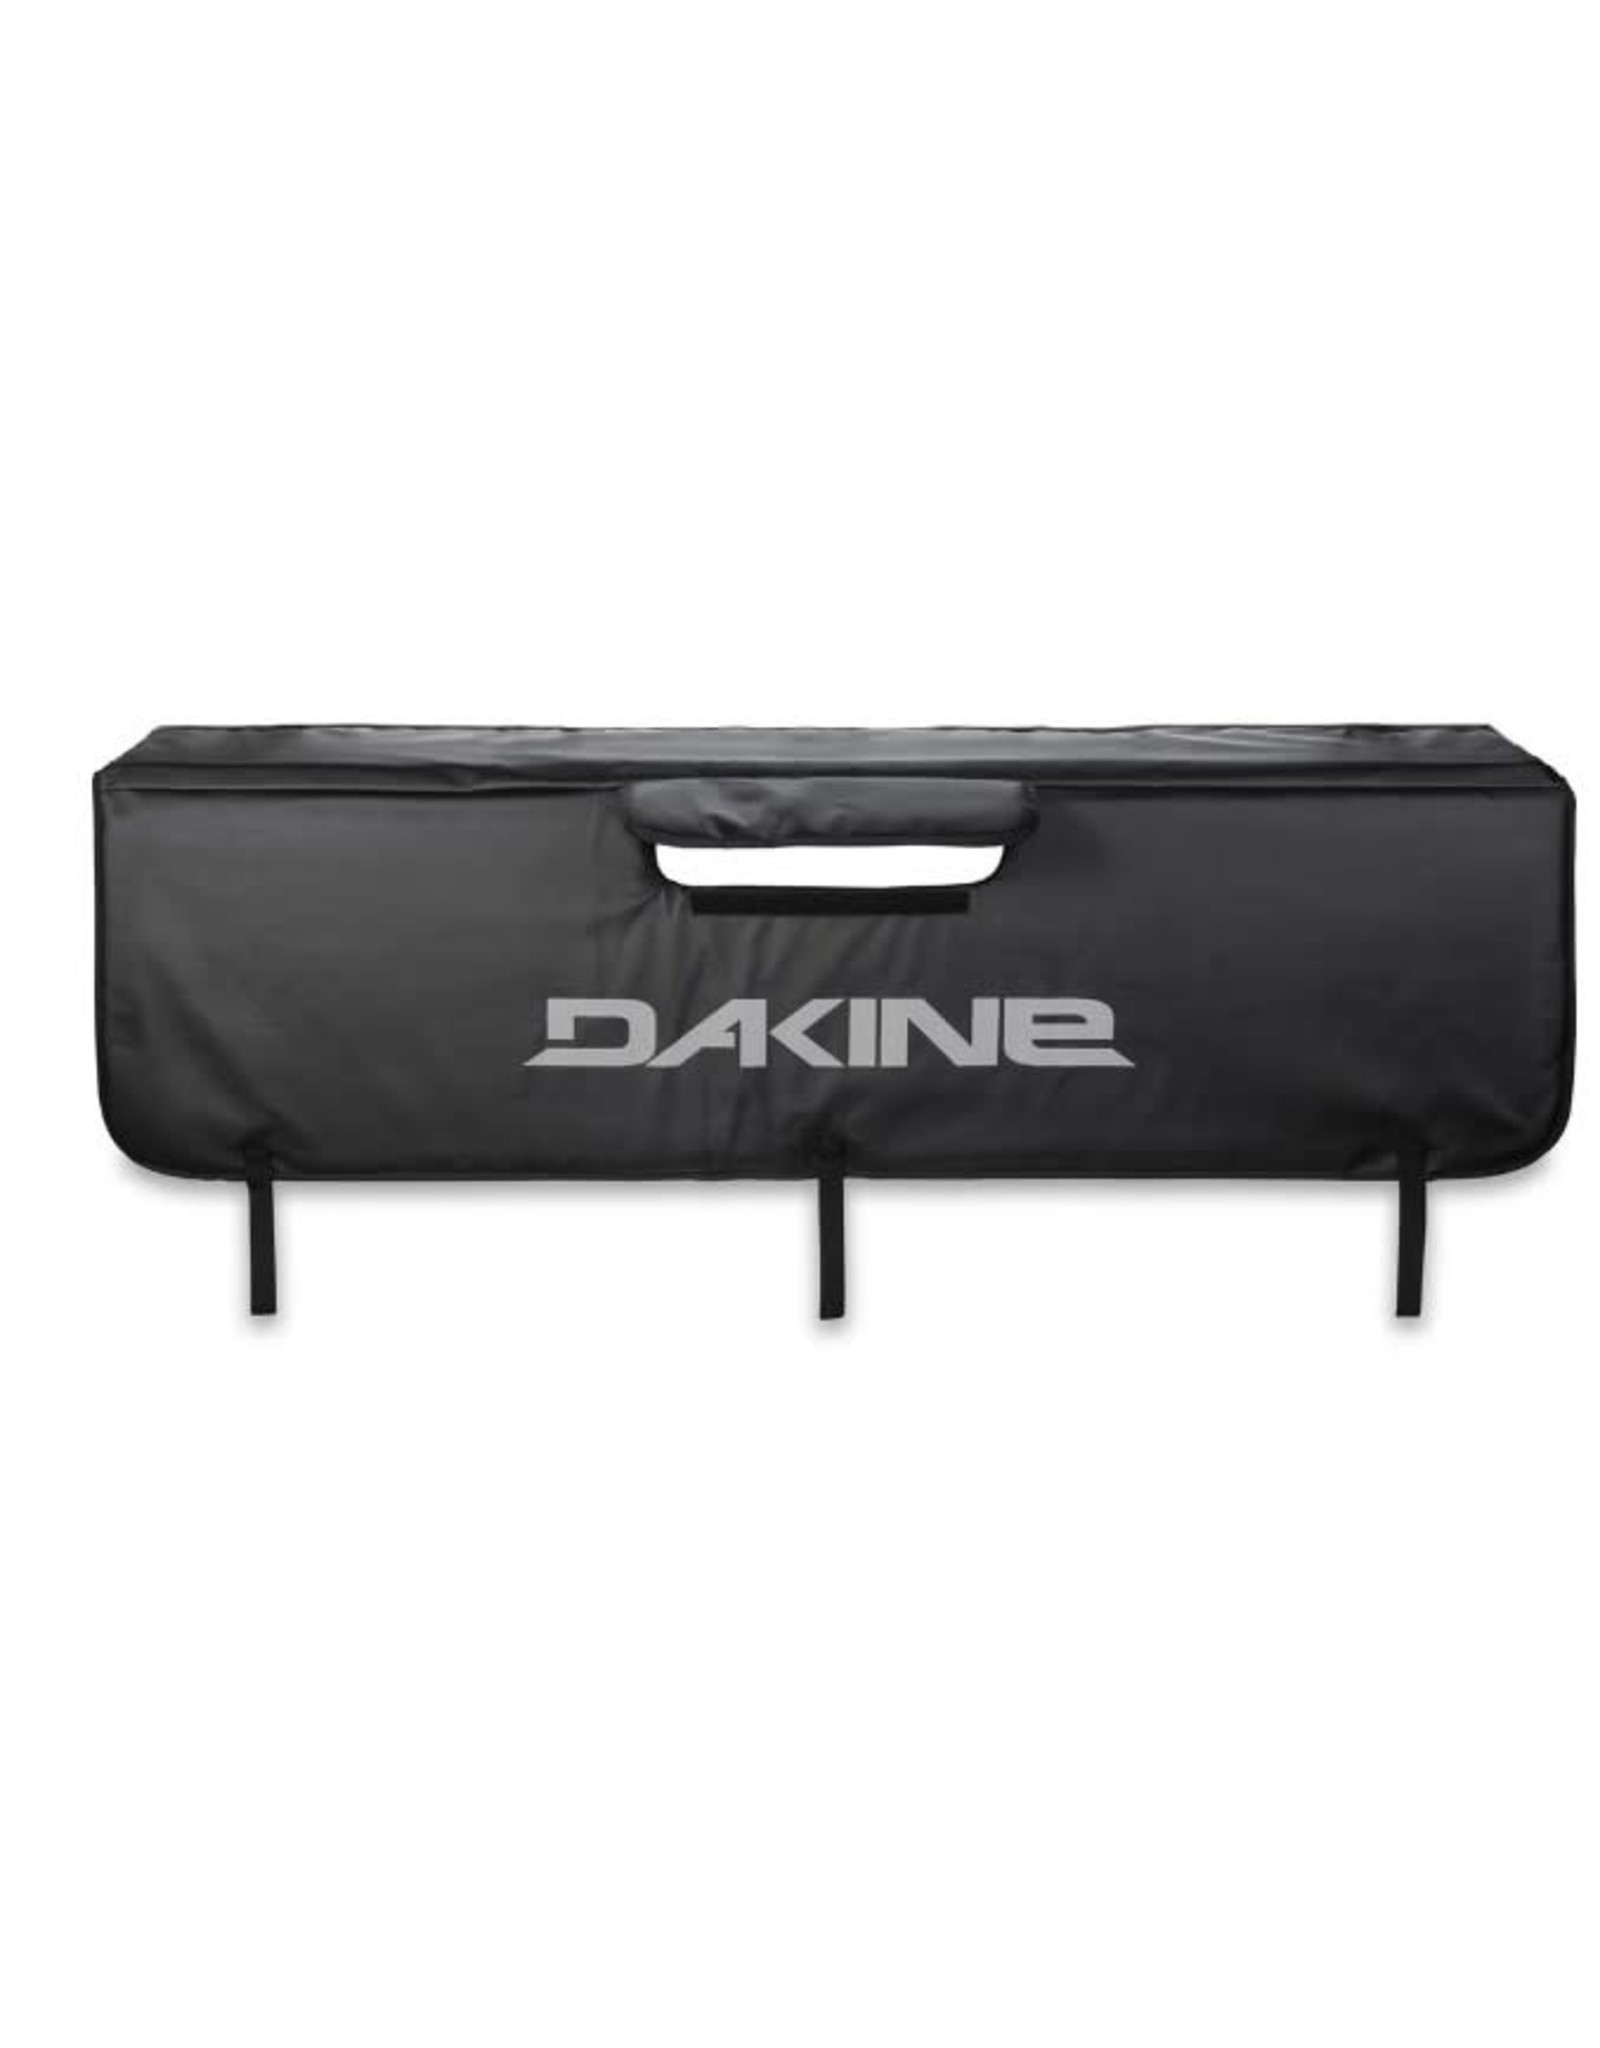 Dakine Panneau Tailgate Dakine (pick-up pad)